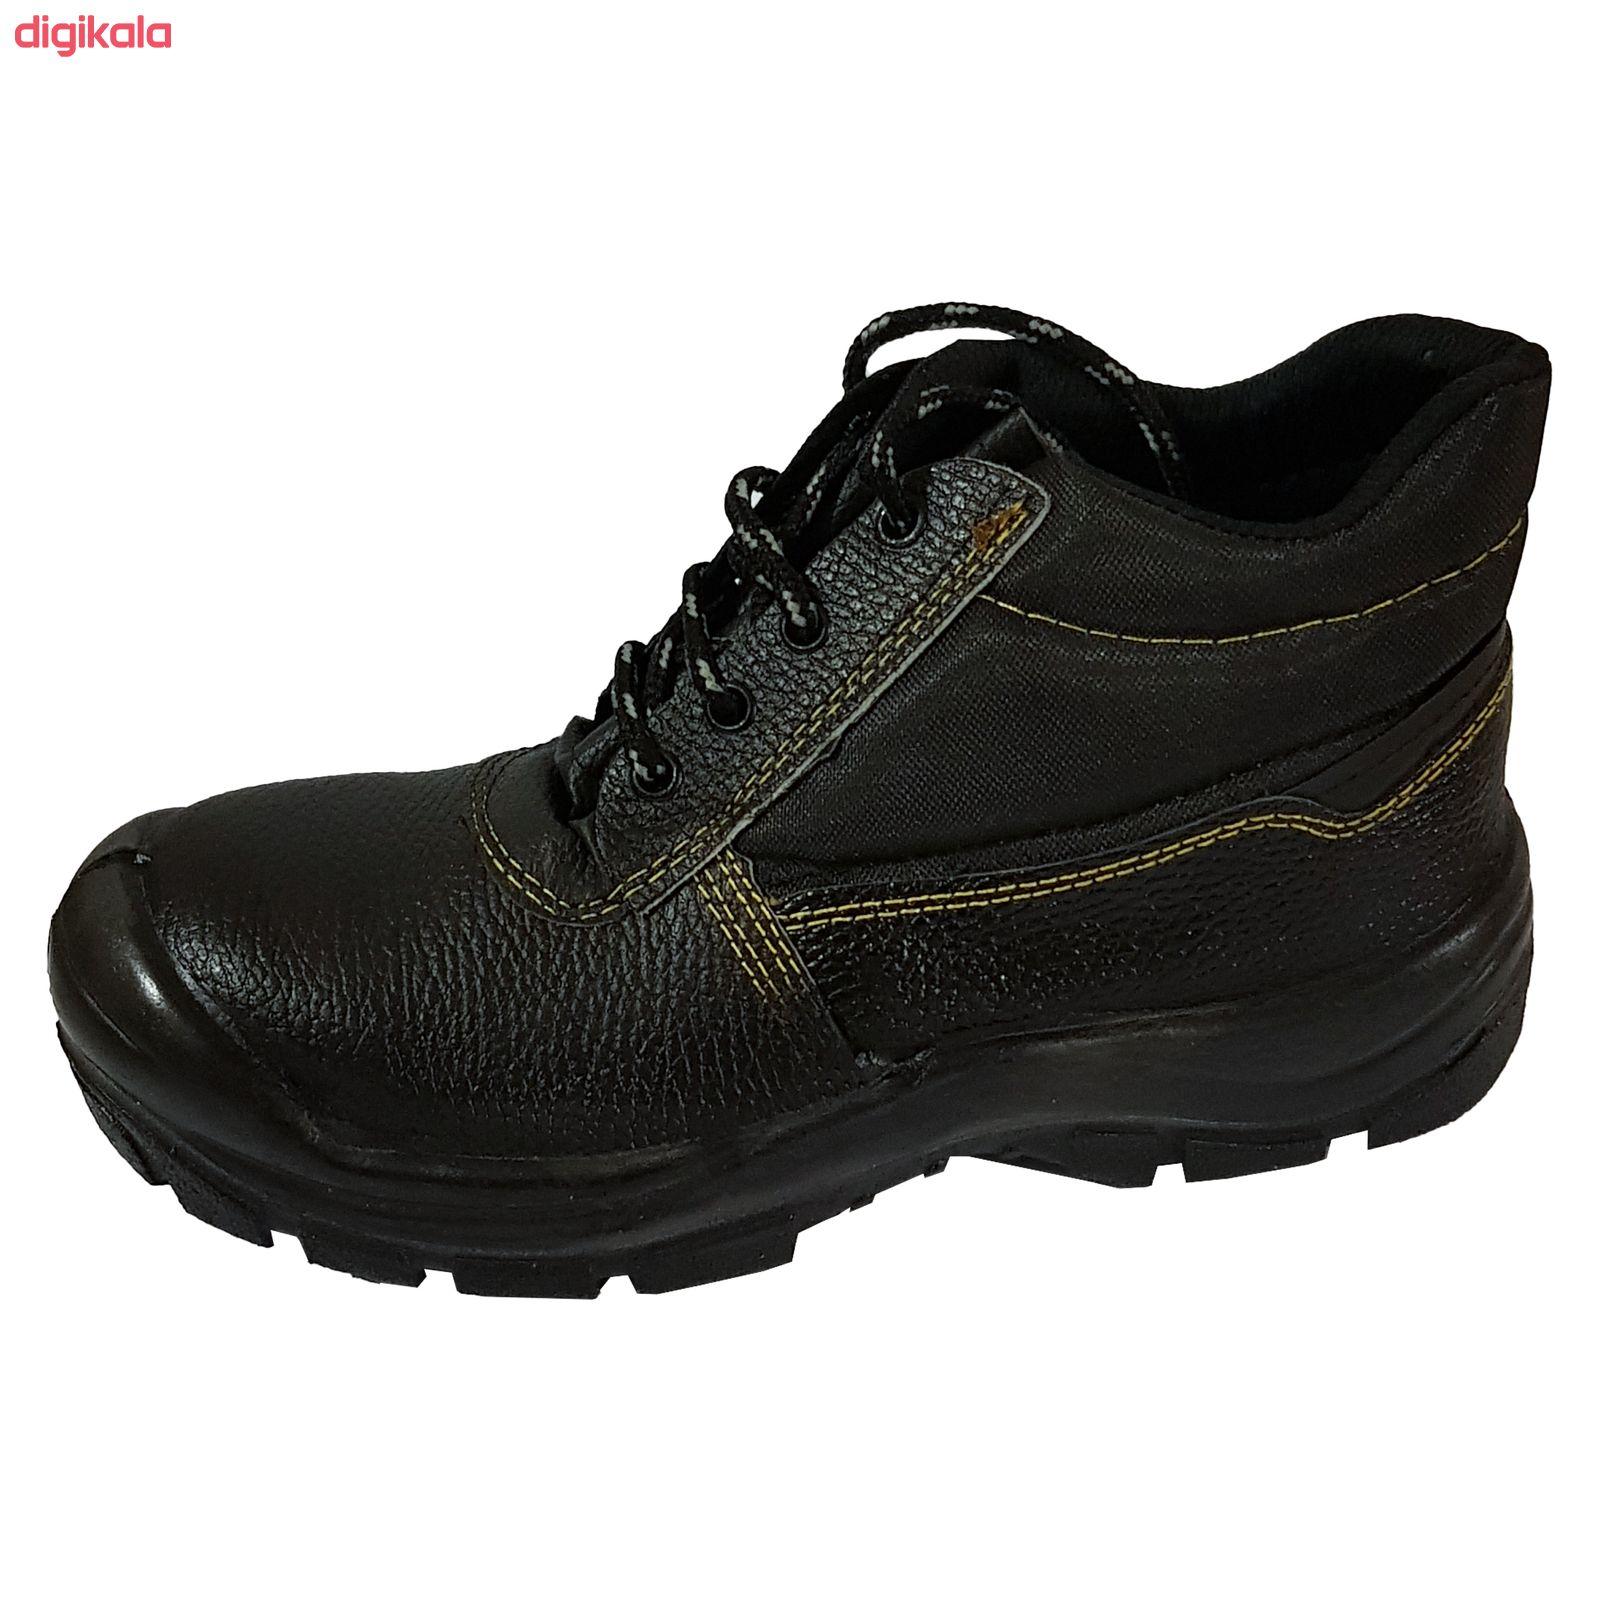 کفش کوهنوردی مردانه مدل یاشار کد YSHR222 main 1 4